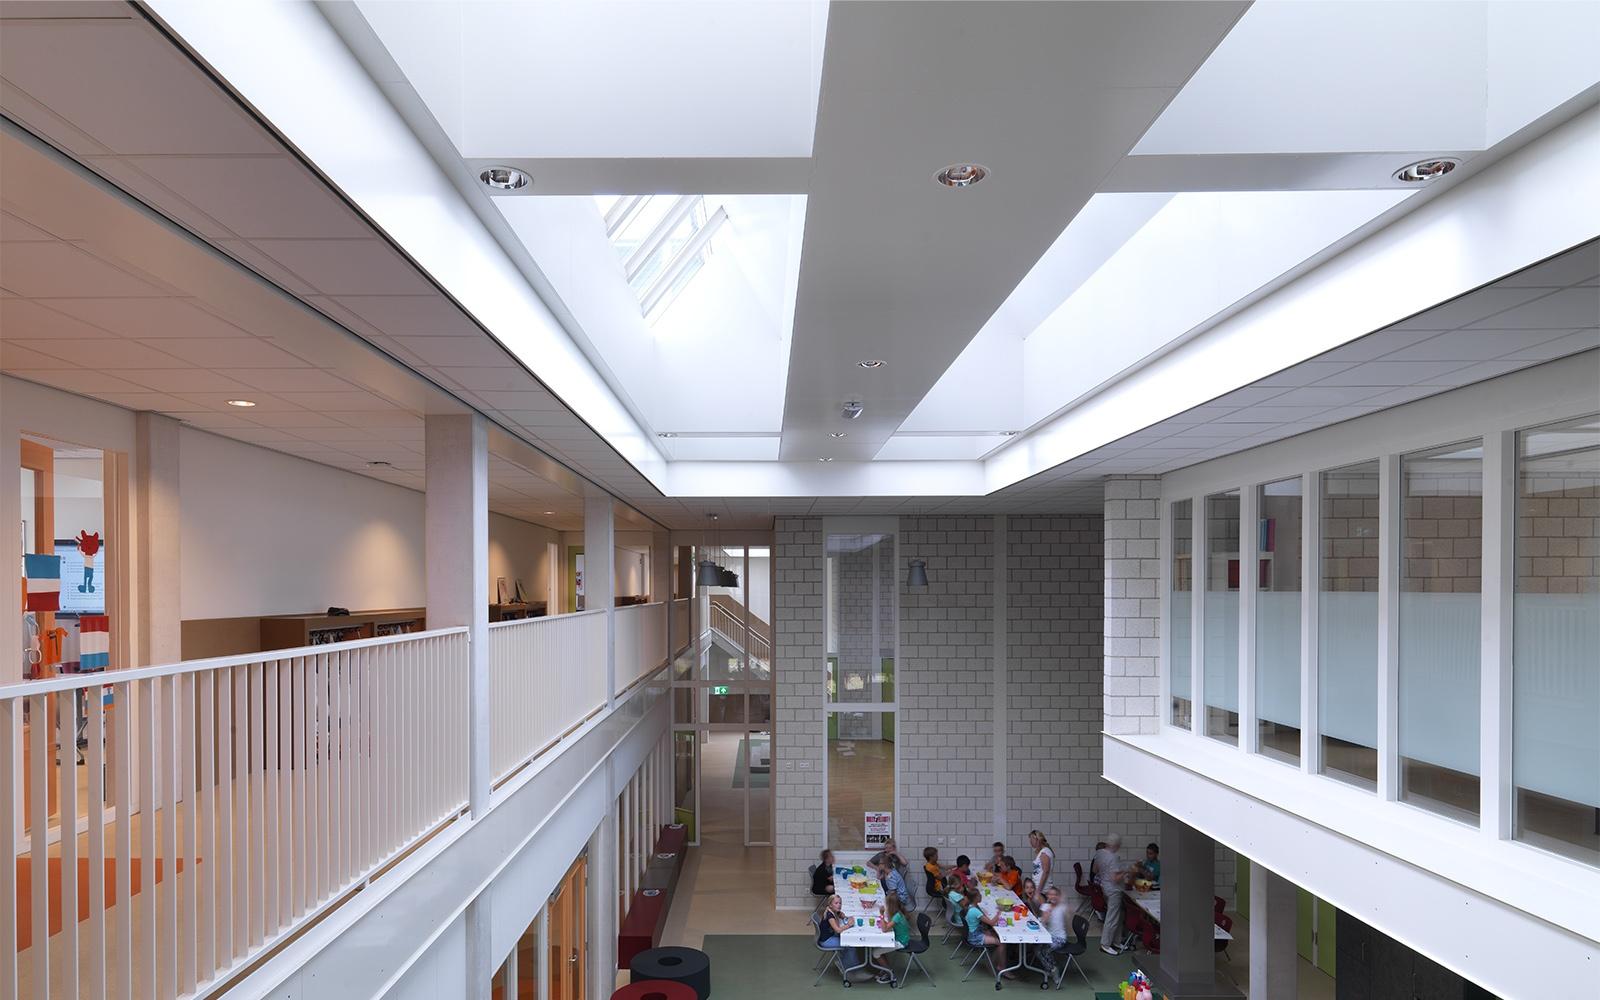 Architectural lighting design in school